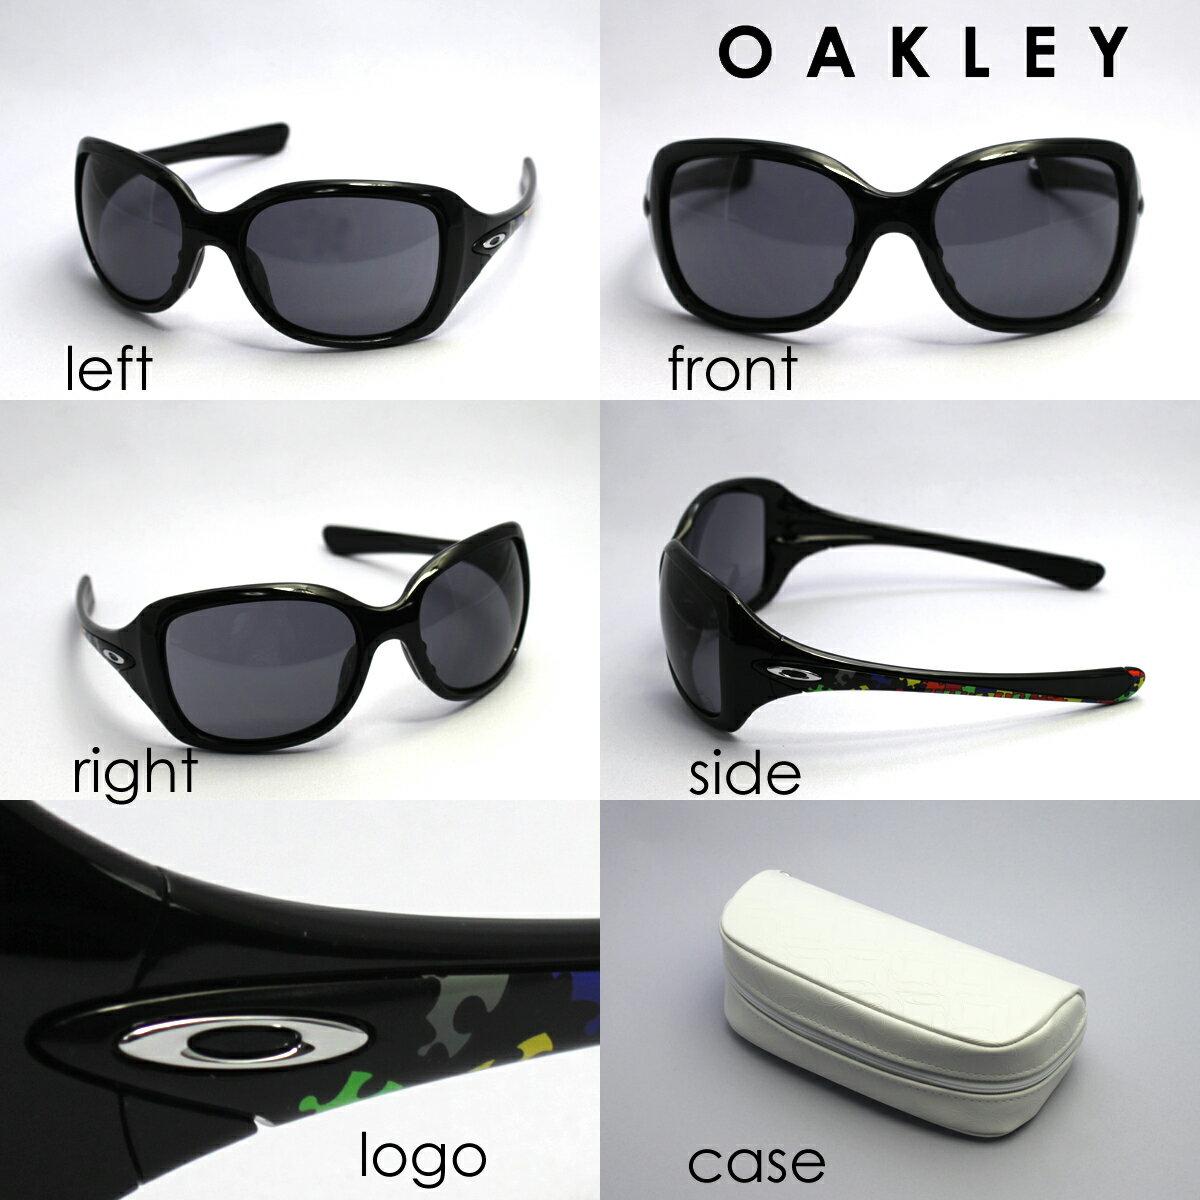 oakley taca necessity sunglasses heritage malta rh heritagemalta org